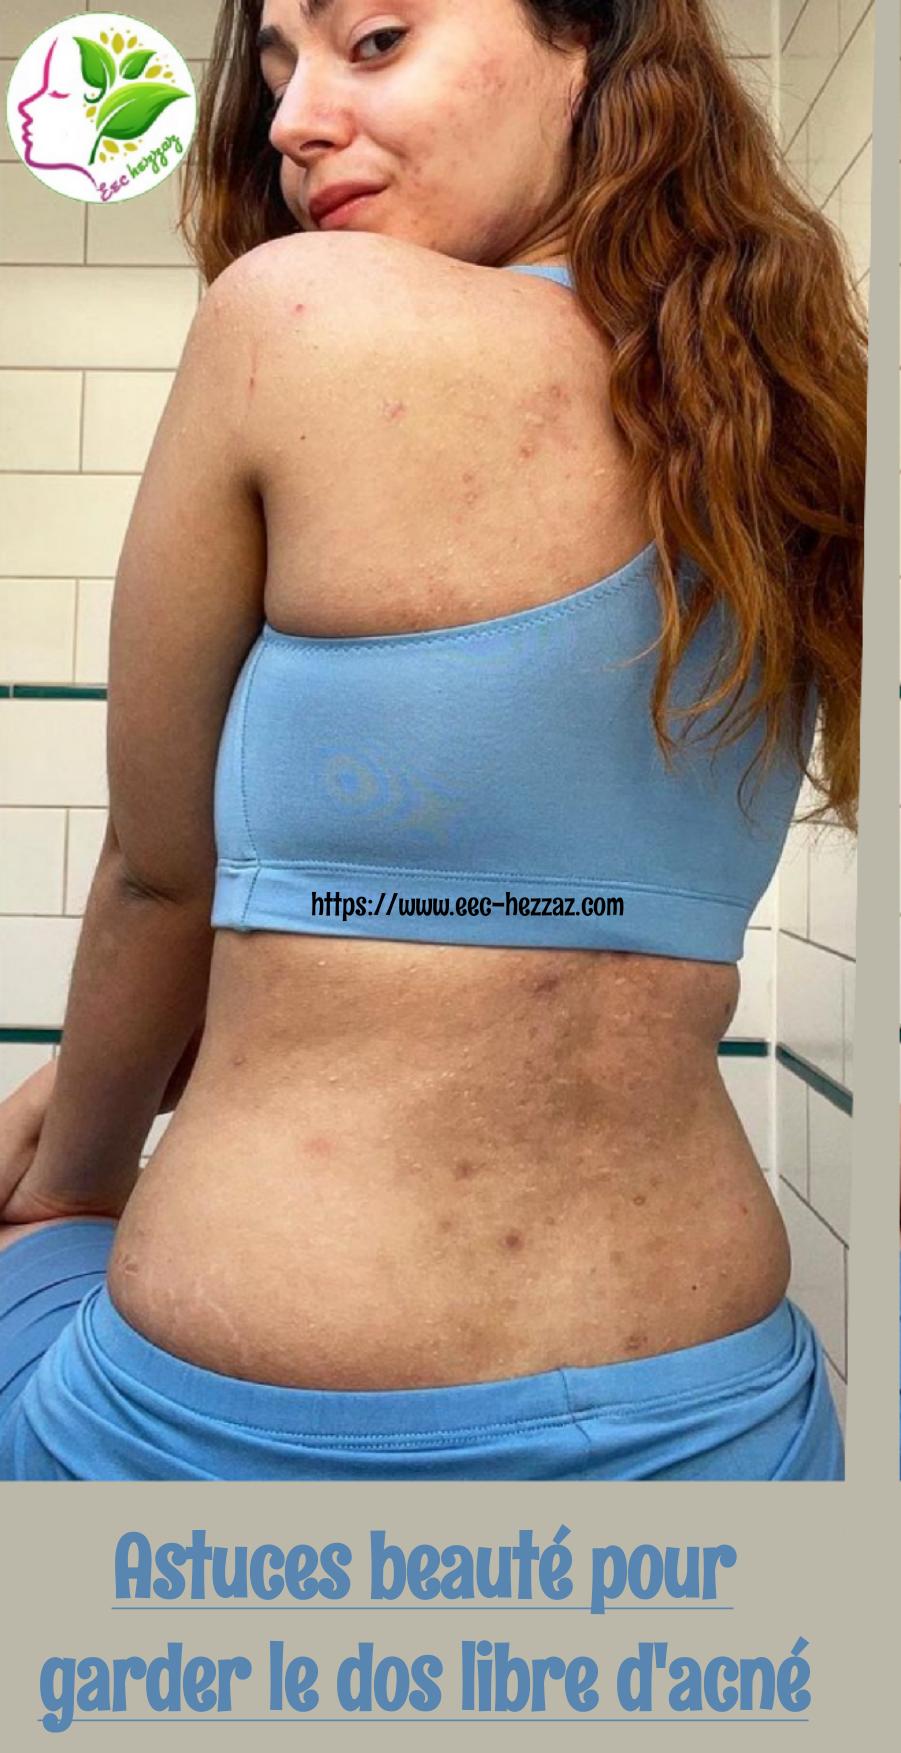 Astuces beauté pour garder le dos libre d'acné